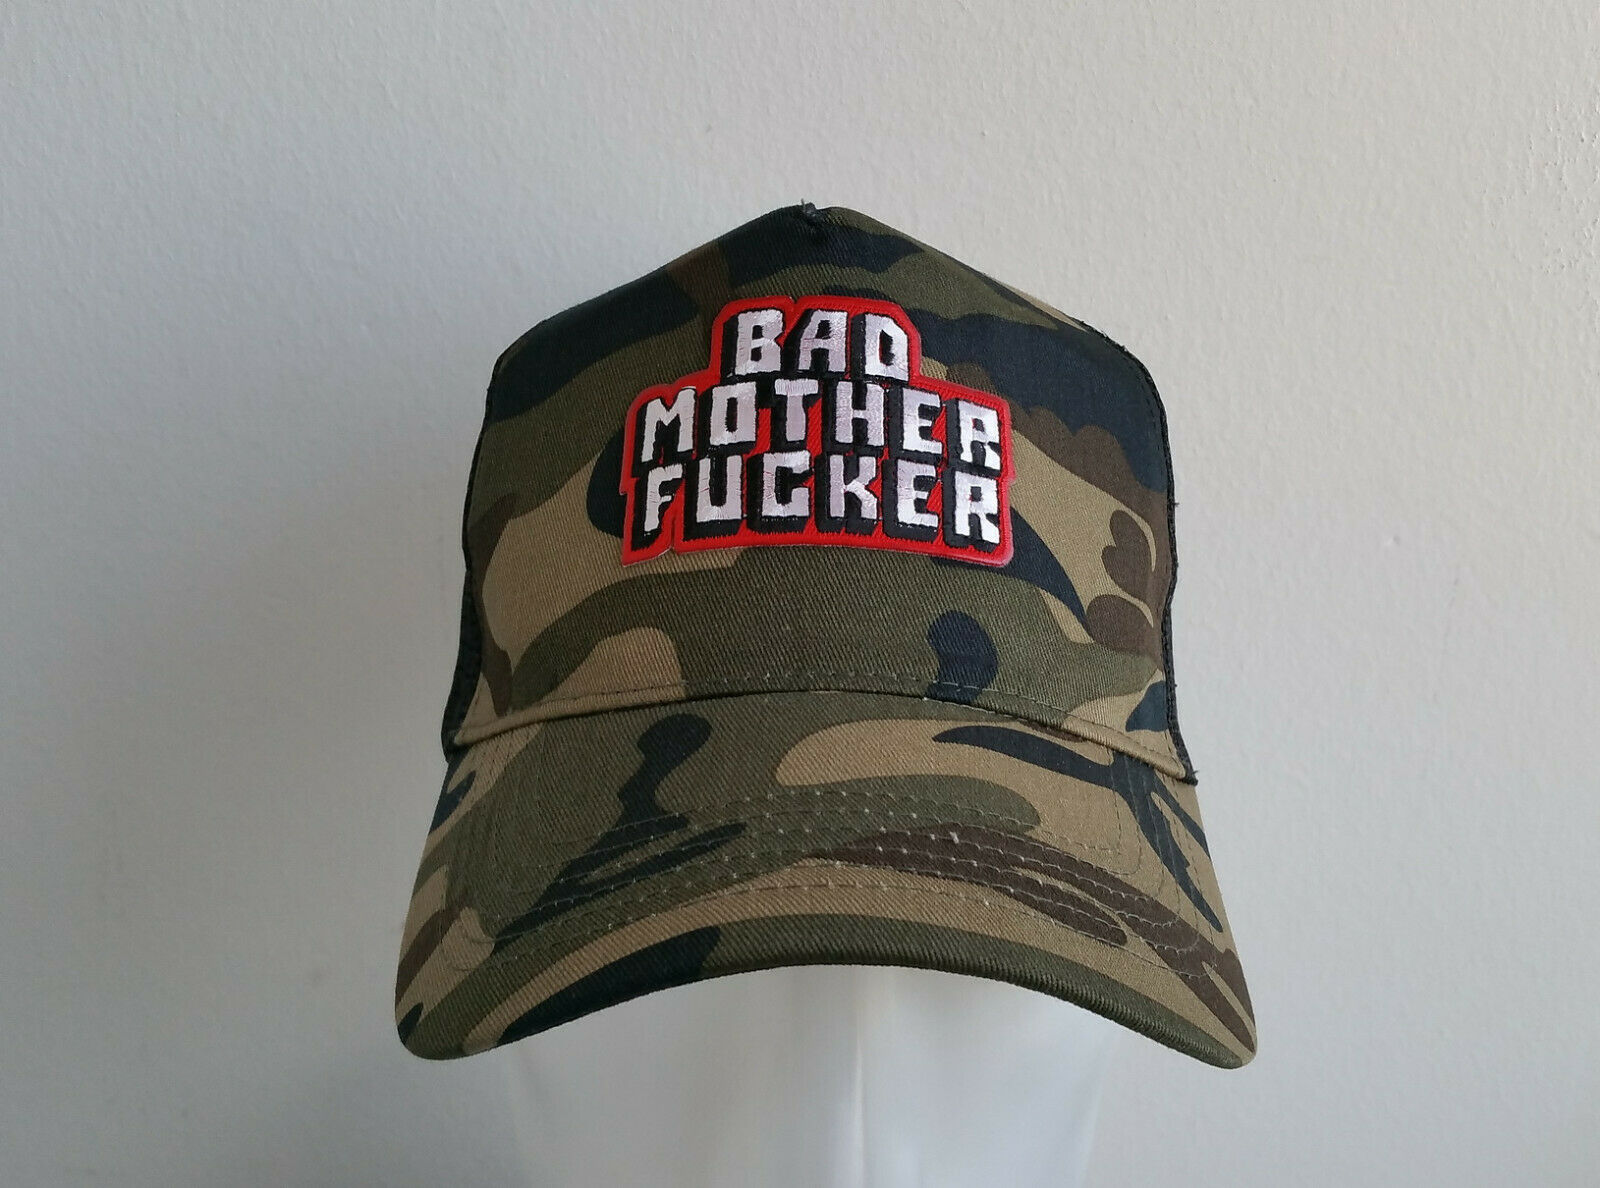 Bad Motherfucker Trucker Cap Mütze Redneck BMF Camouflage